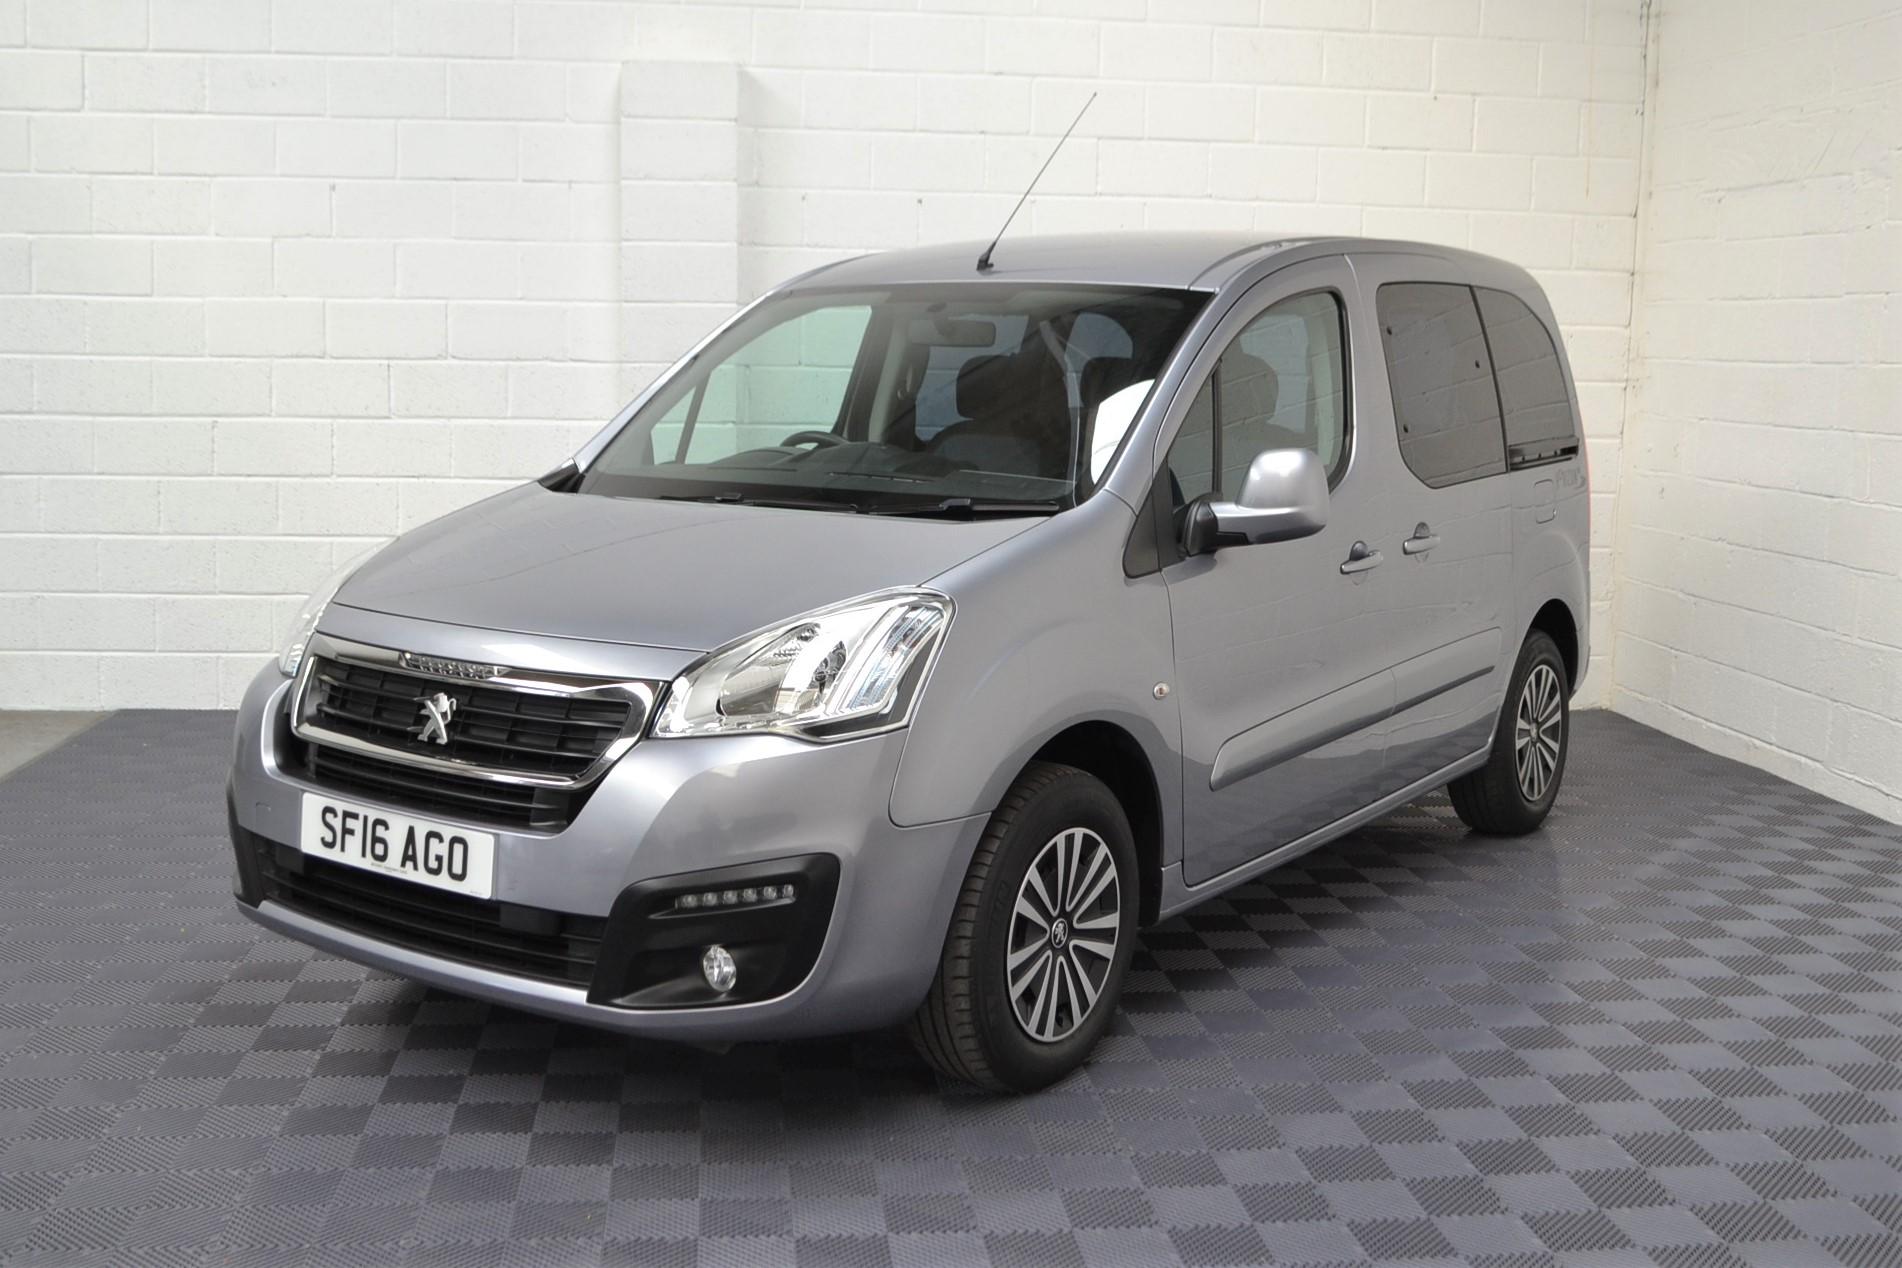 Used Wav Cars for Sale UK Citroen Berlingo WAV Car Peugeot Partner Petrol Wheelchair Accessible Vehicles Buy Sell Bristol Somerset Devon Dorset 17